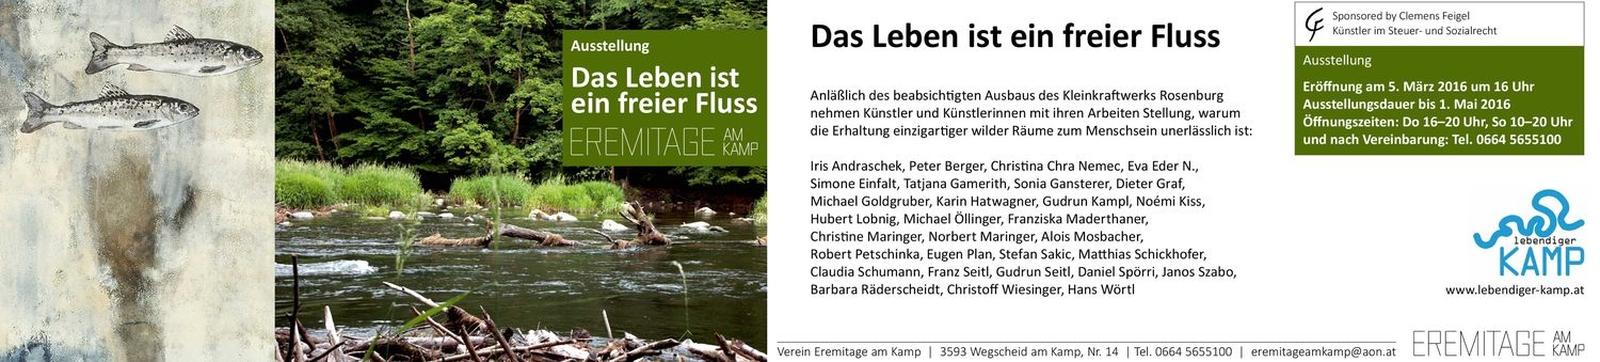 20160305 - Eremitage am Kamp / DAS LEBEN IST EIN FREIER FLUSS / Wegscheid am Kamp